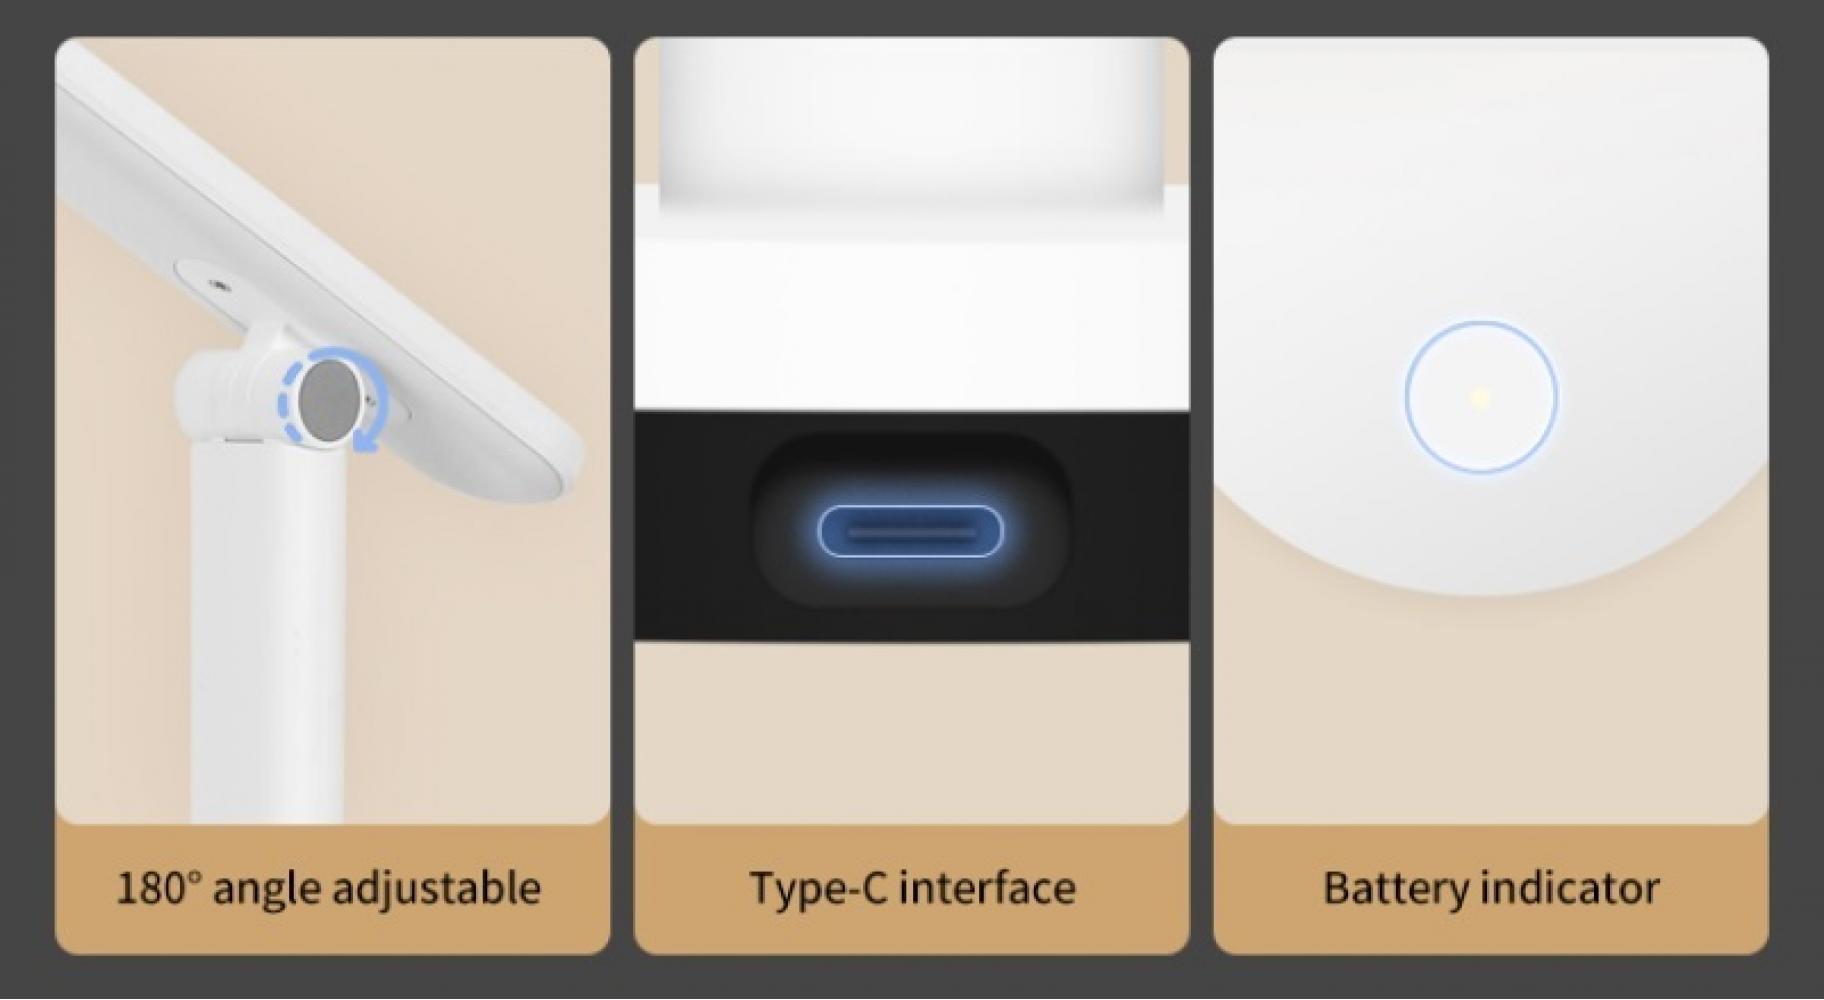 Настольная лампа Xiaomi Yeelight Folding Desk Lamp Z1 Pro